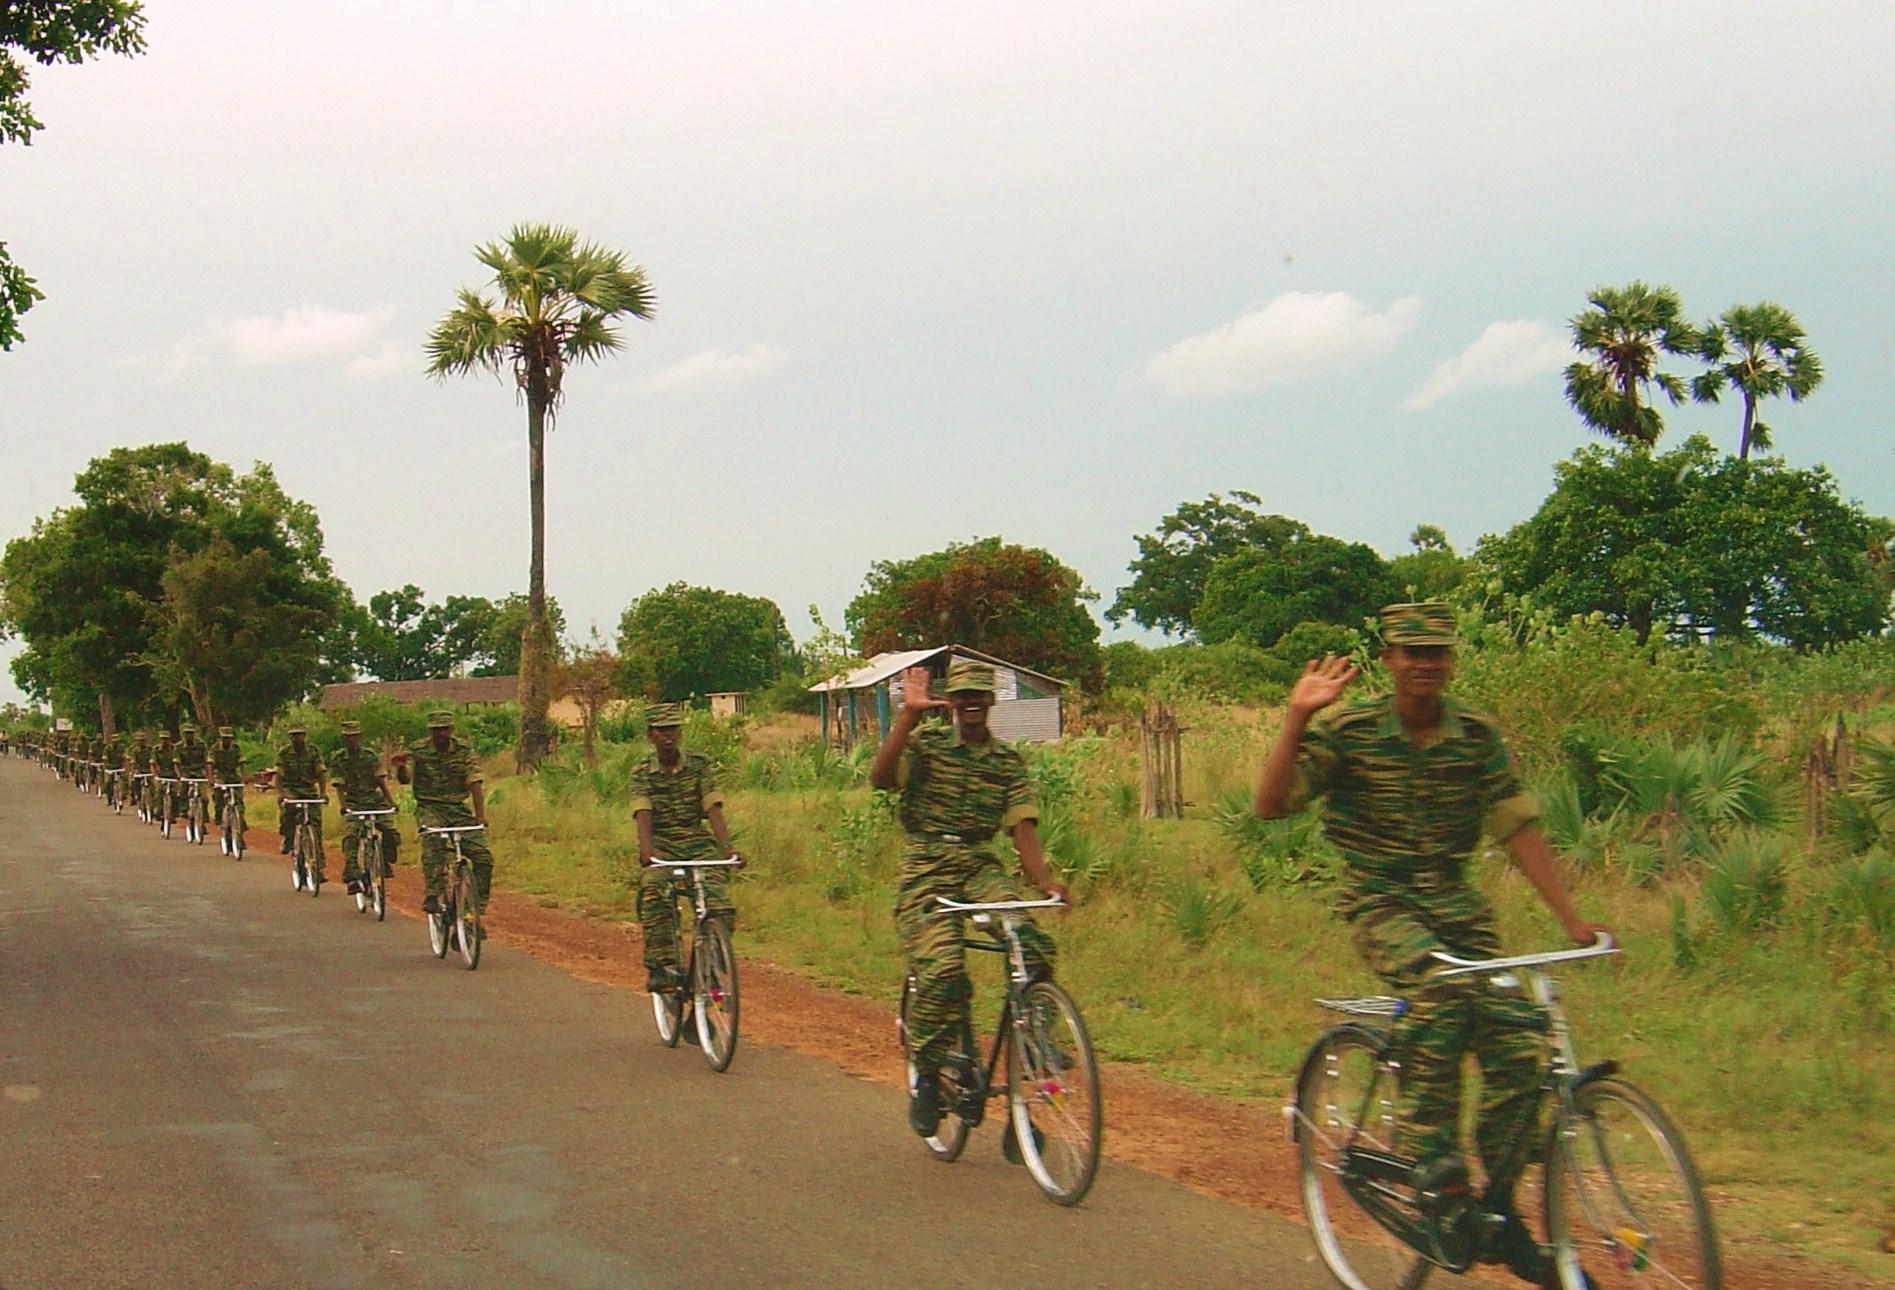 LTTE bike platoon north of Kilinochi, Sri Lanka, in 2004. (Wikimedia)